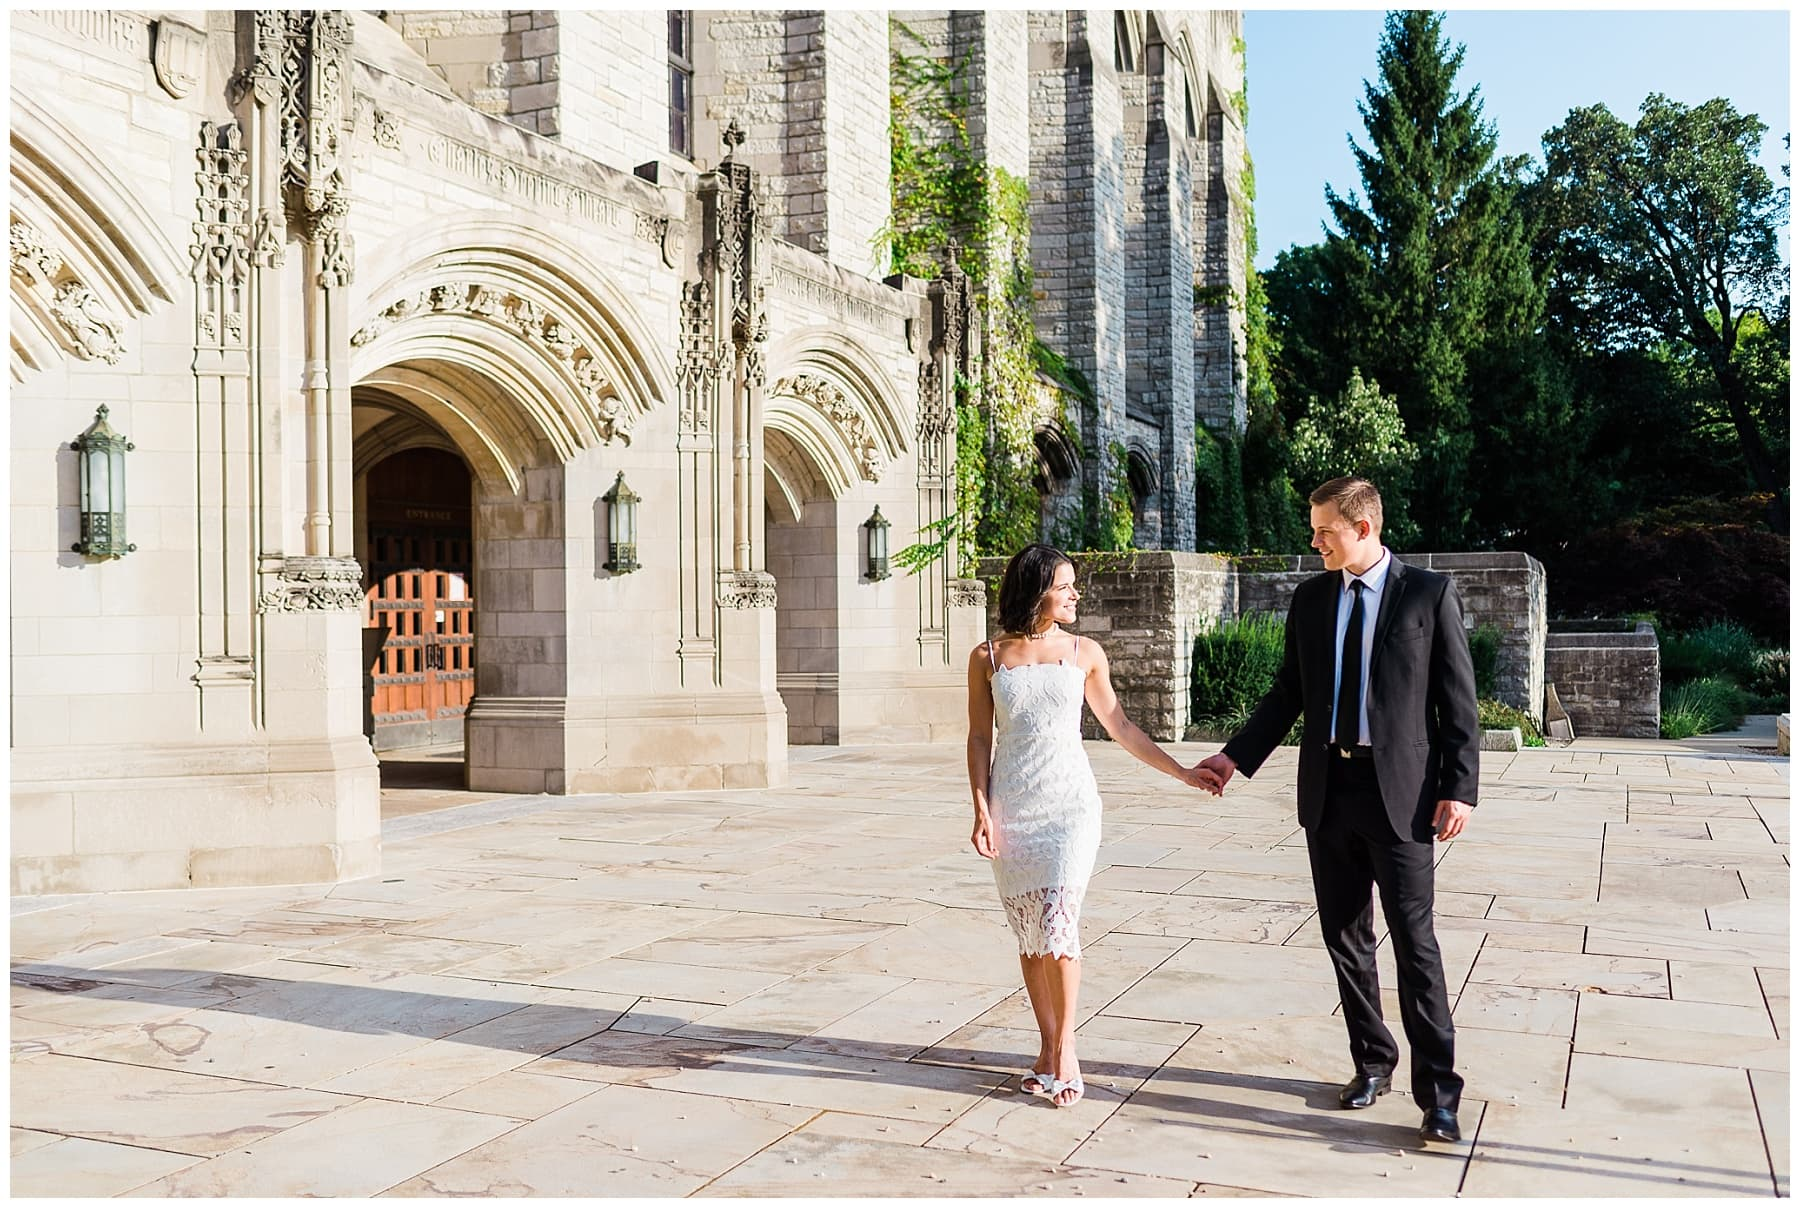 micro wedding planning tips